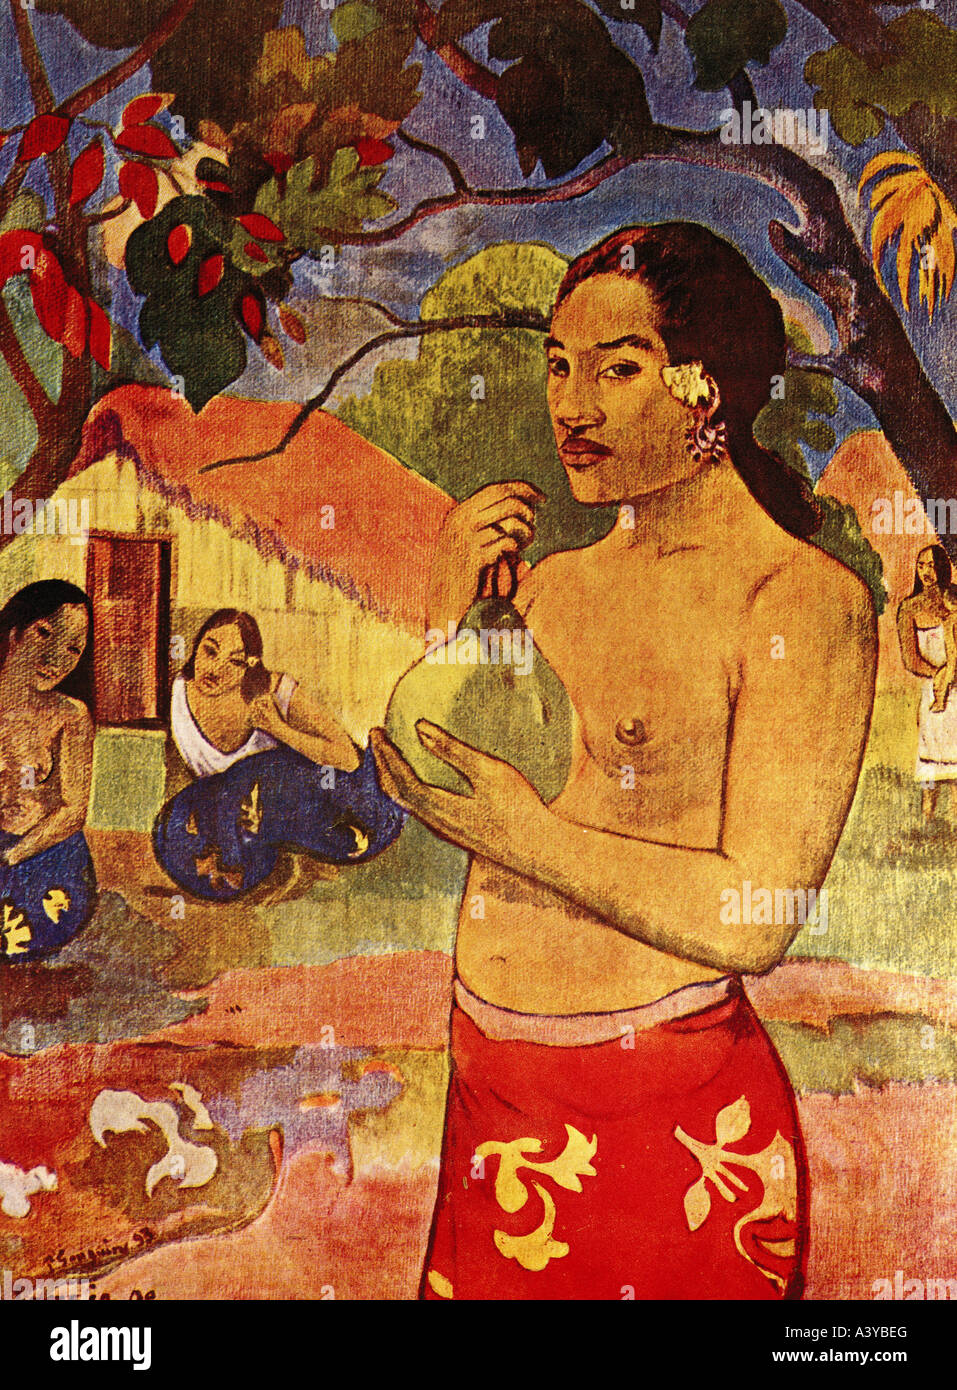 """Fine Arts, Gauguin, Paul, (1848-1903), Malerei,""Tahiti Frau mit Obst"", 1893, Öl auf Leinwand, Stockbild"